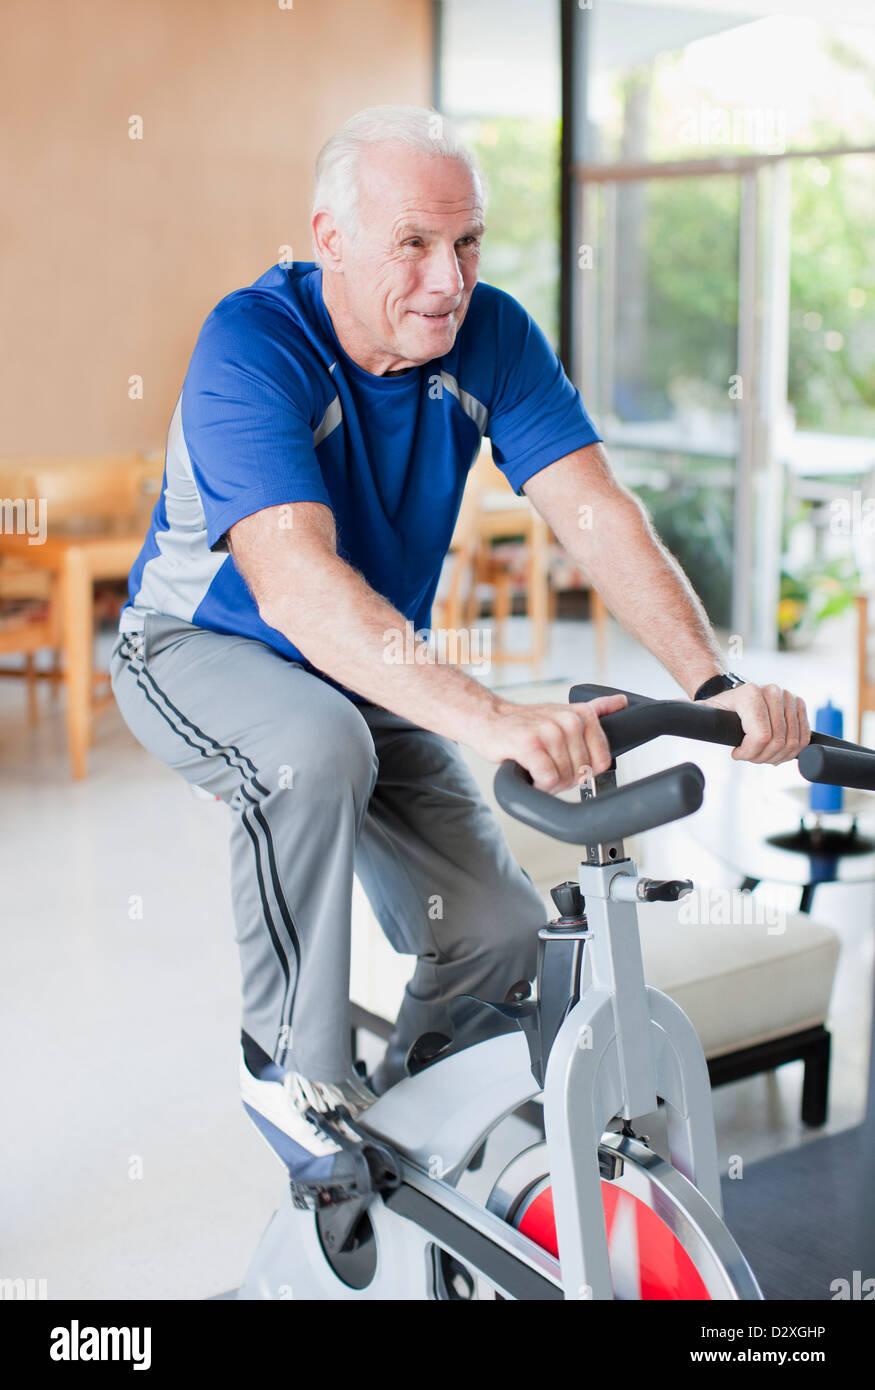 Older Man Riding Exercise Bike At Home Stock Photo